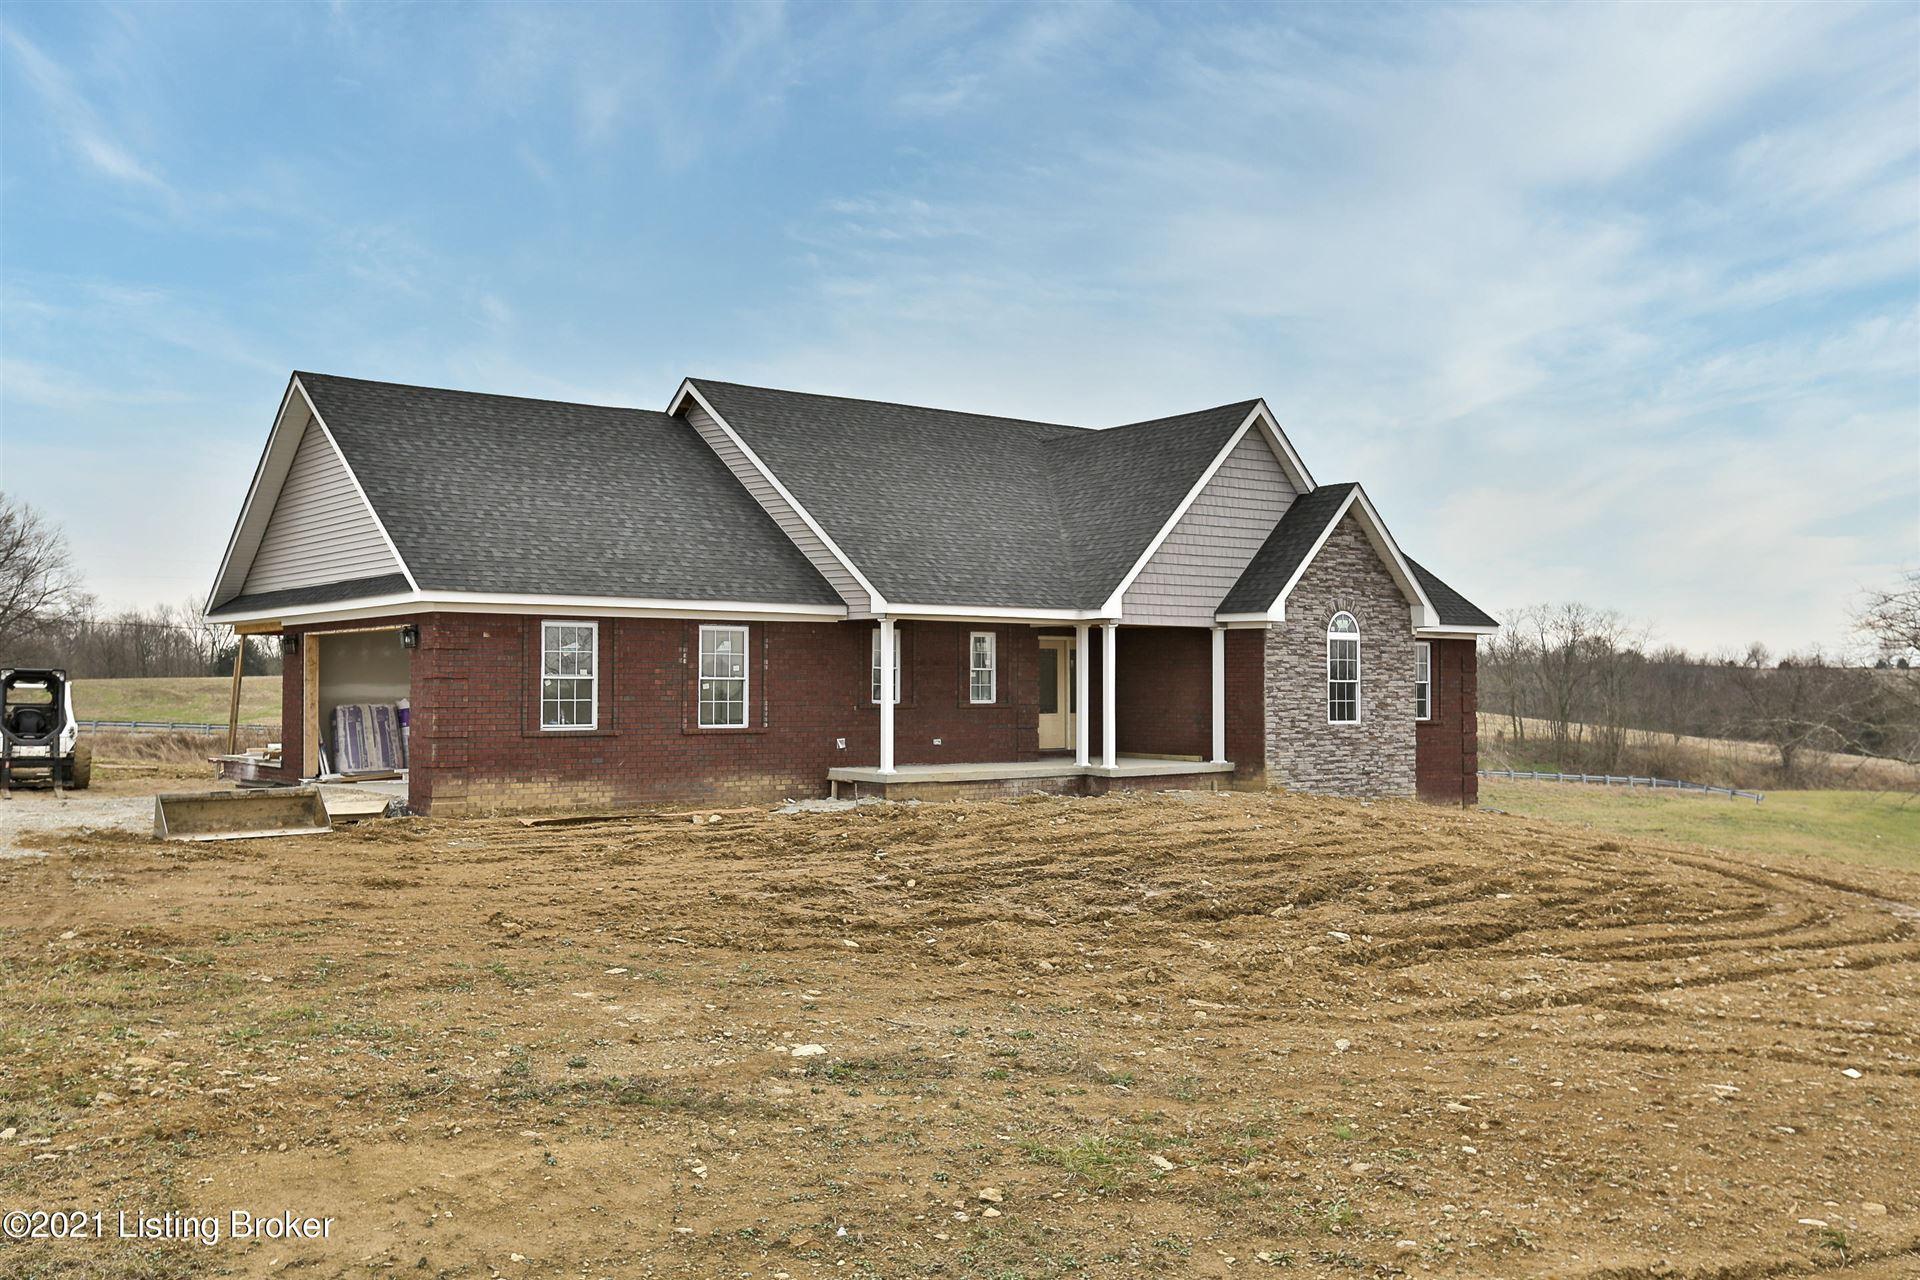 Photo of 8 Overlook Ct, Taylorsville, KY 40071 (MLS # 1577186)